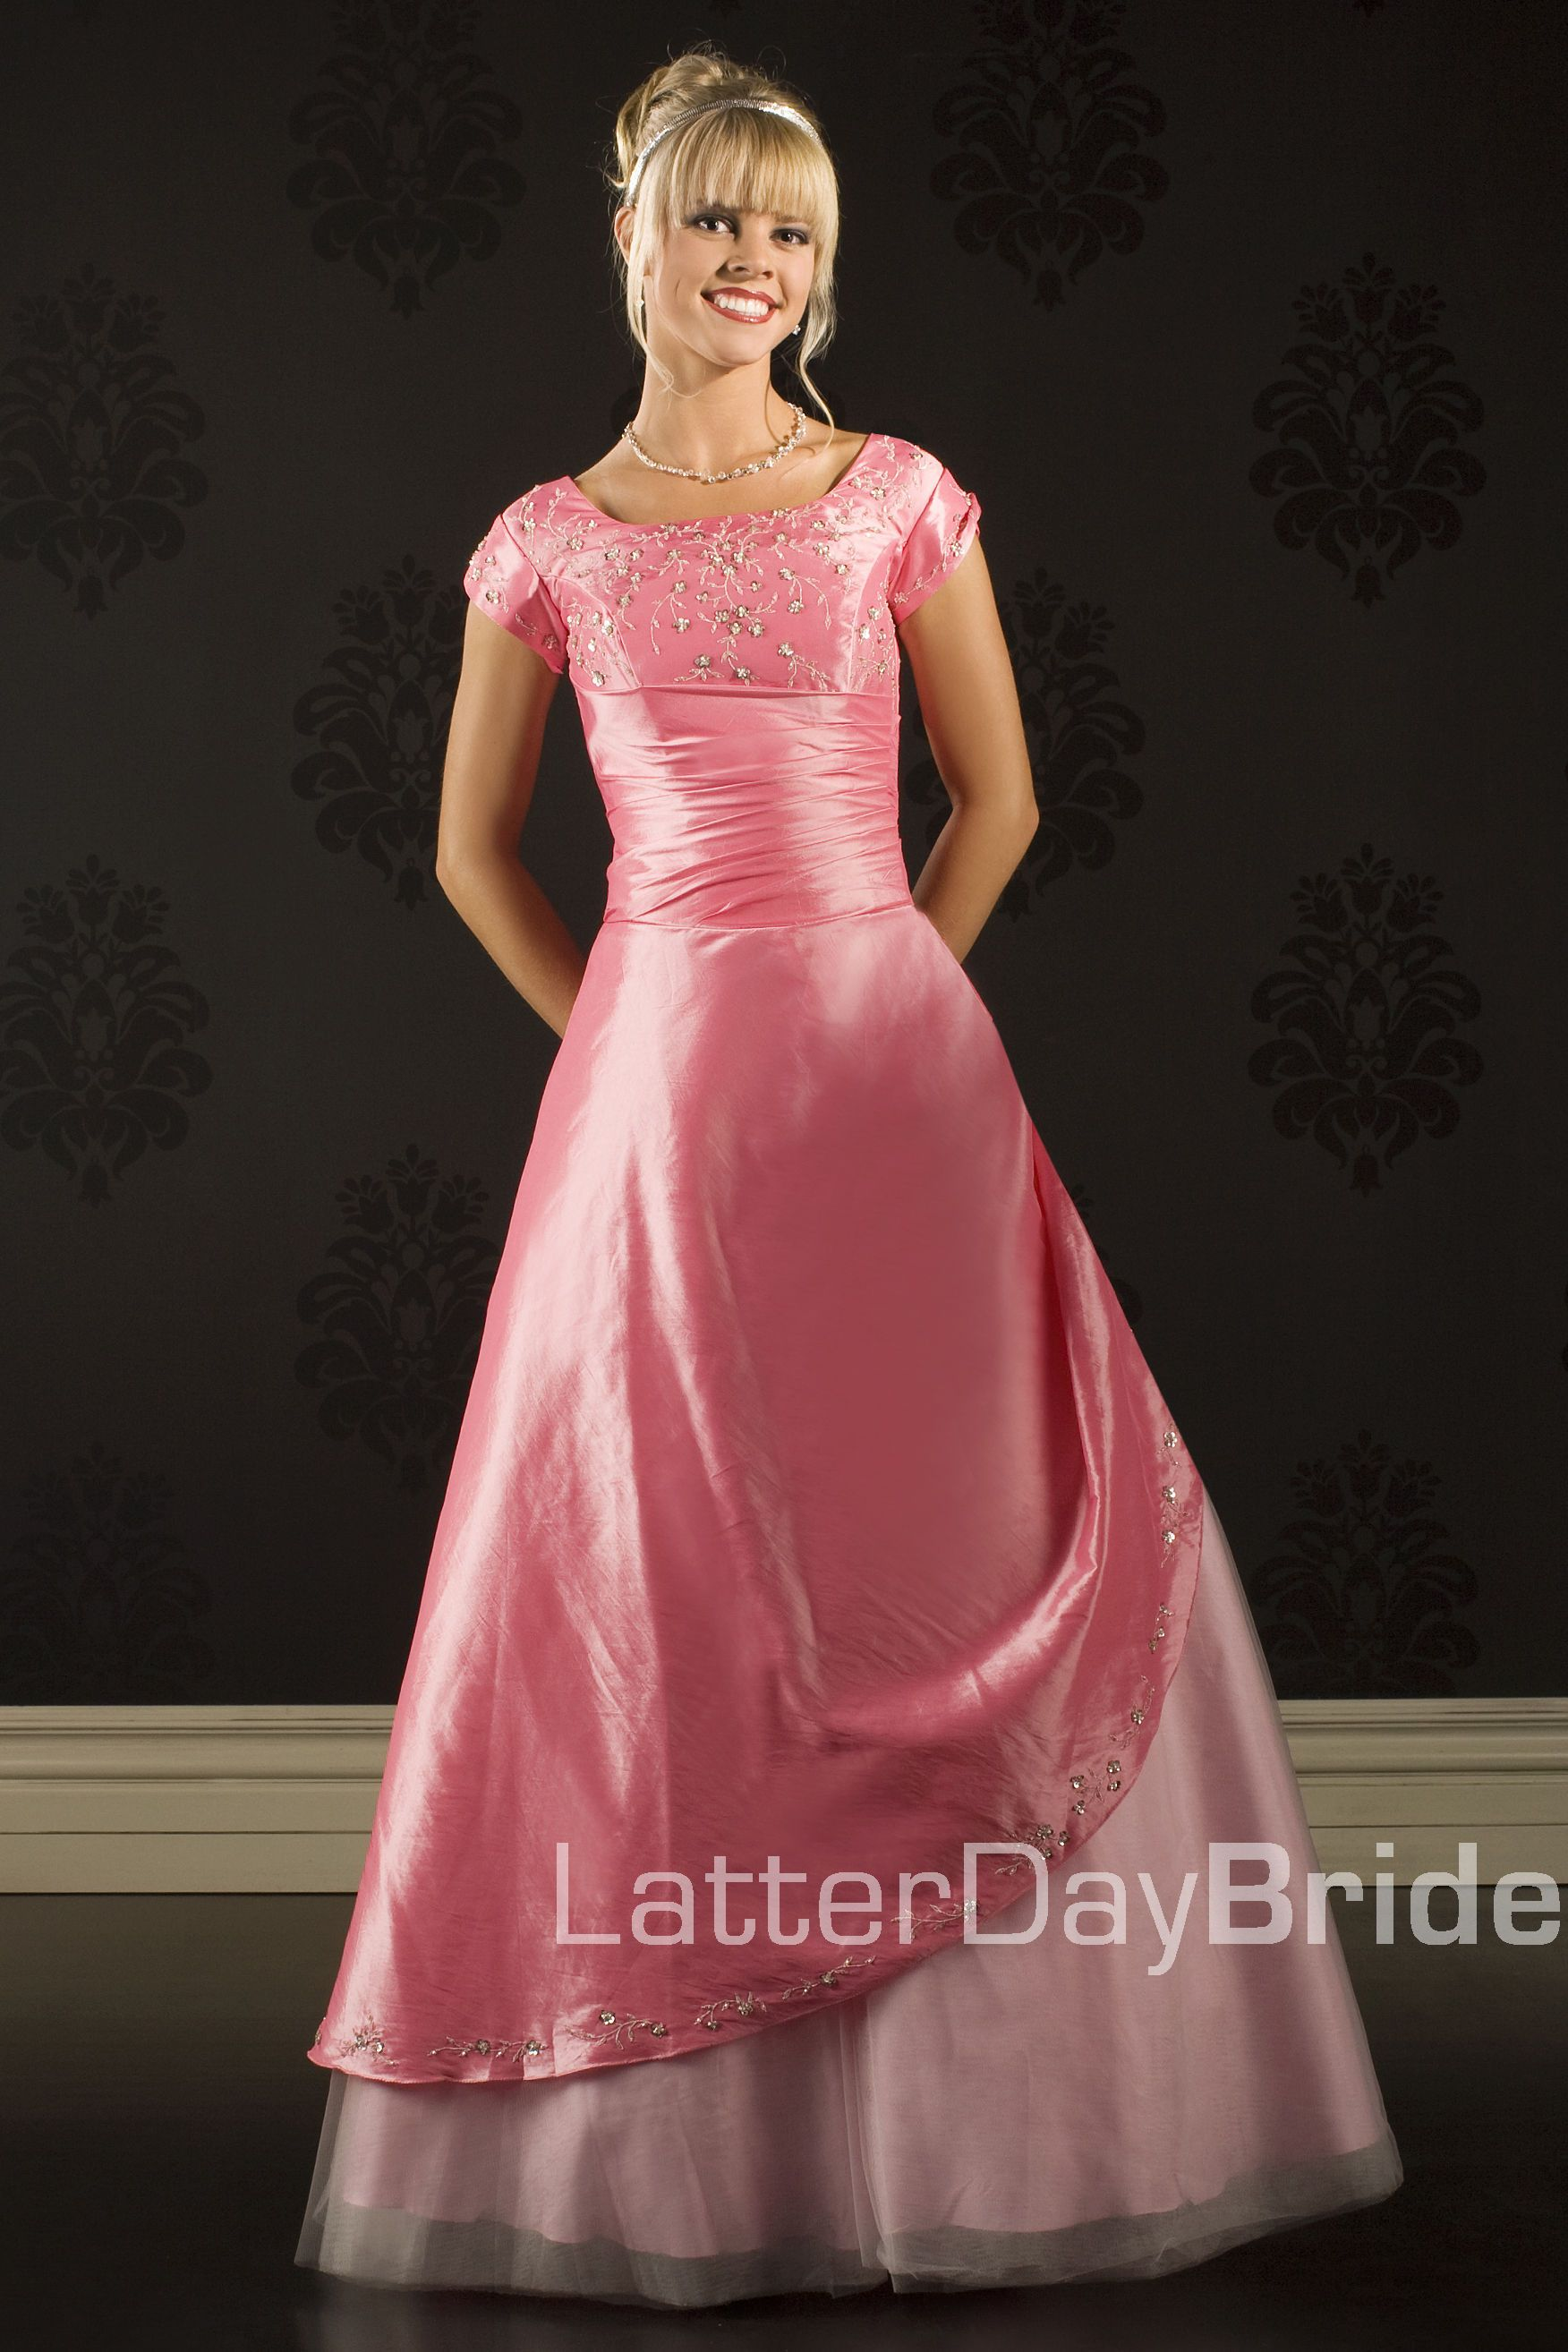 Pin de Heather Tapp en Dresses | Pinterest | Vestidos de noche ...